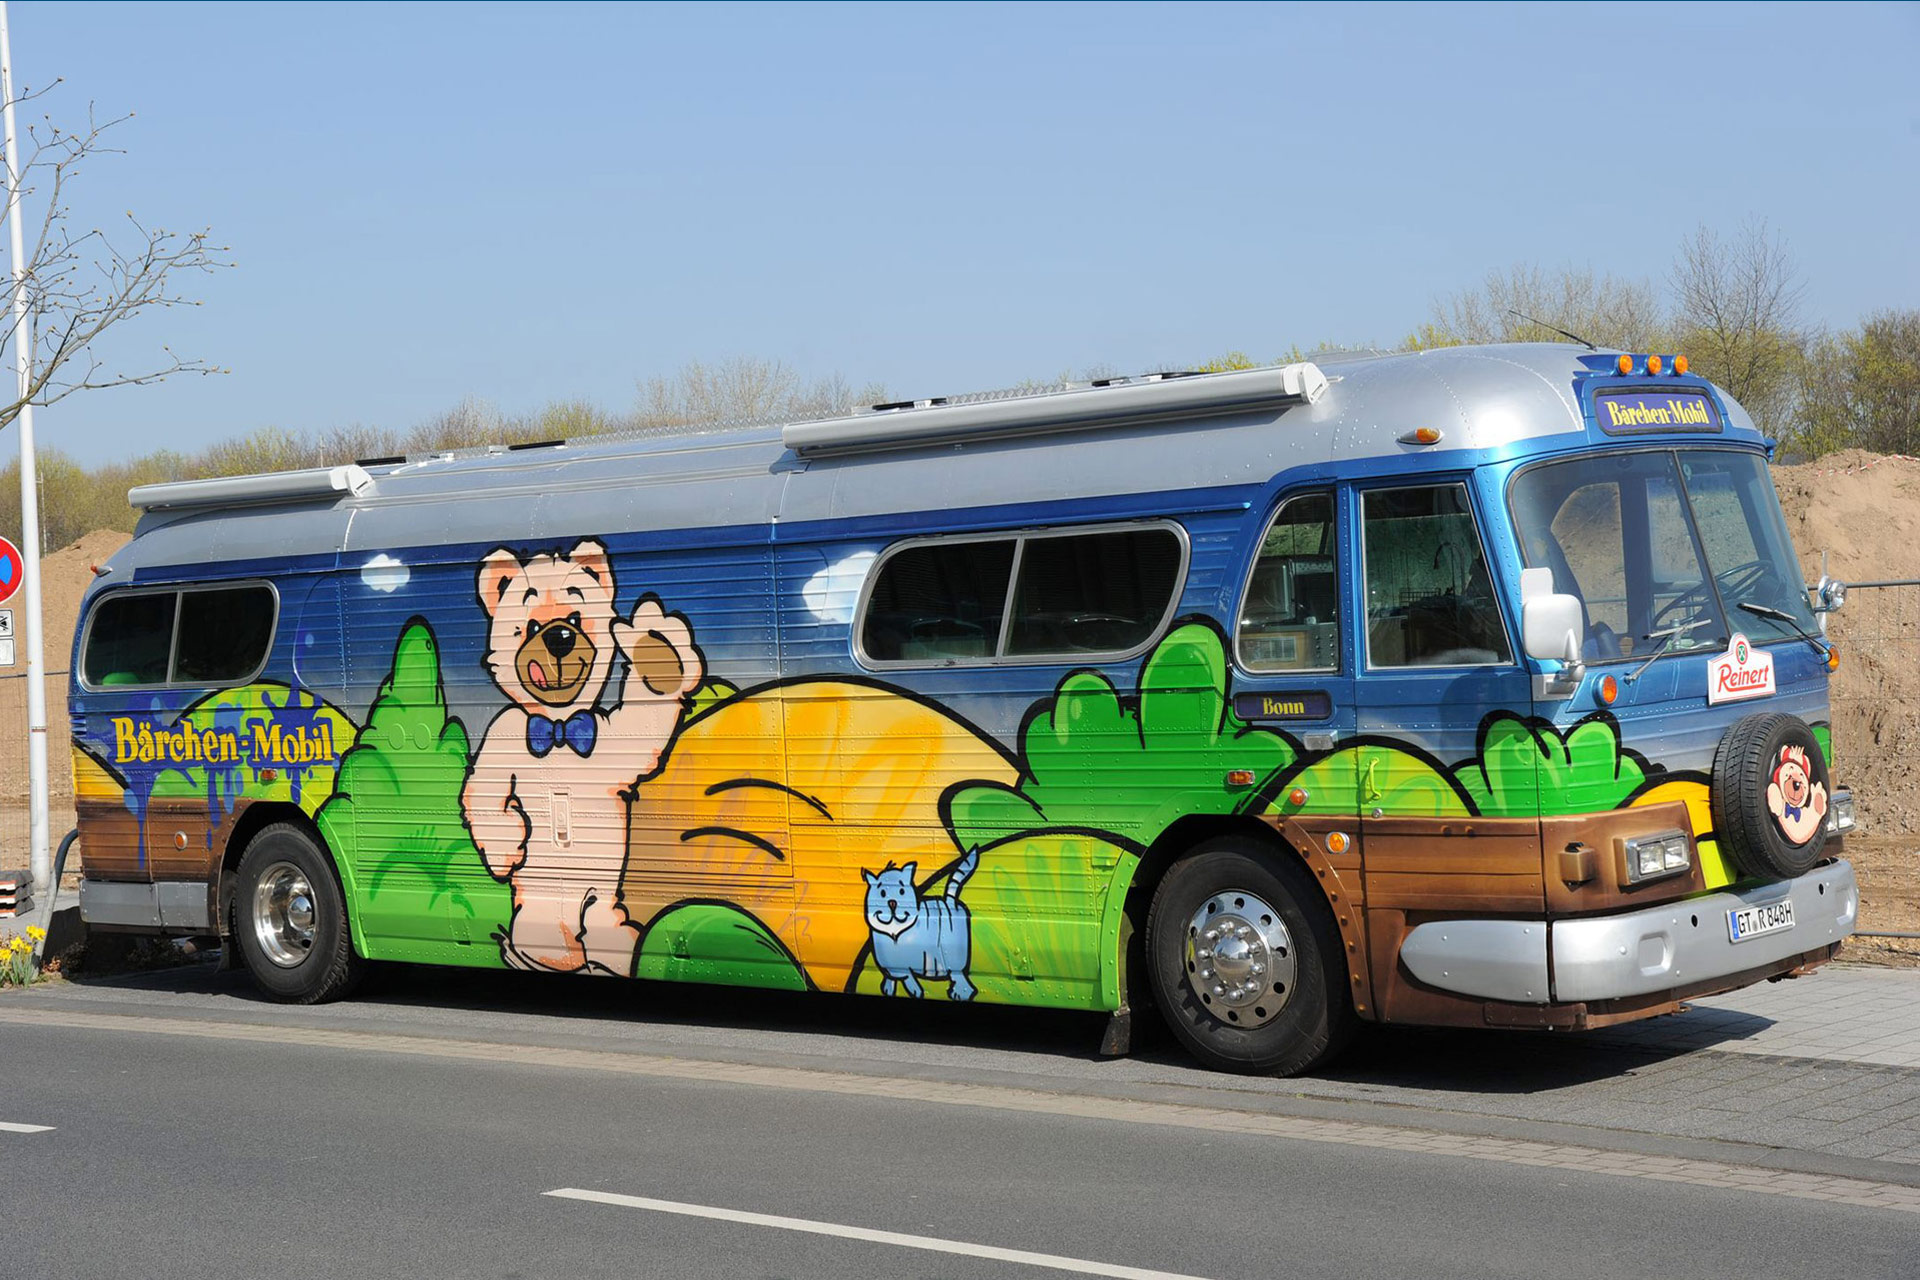 Greyhound, Bus, Graffiti, Reinert, Bärchen, Mobil, Promotion, Reinert, Studio Auckz